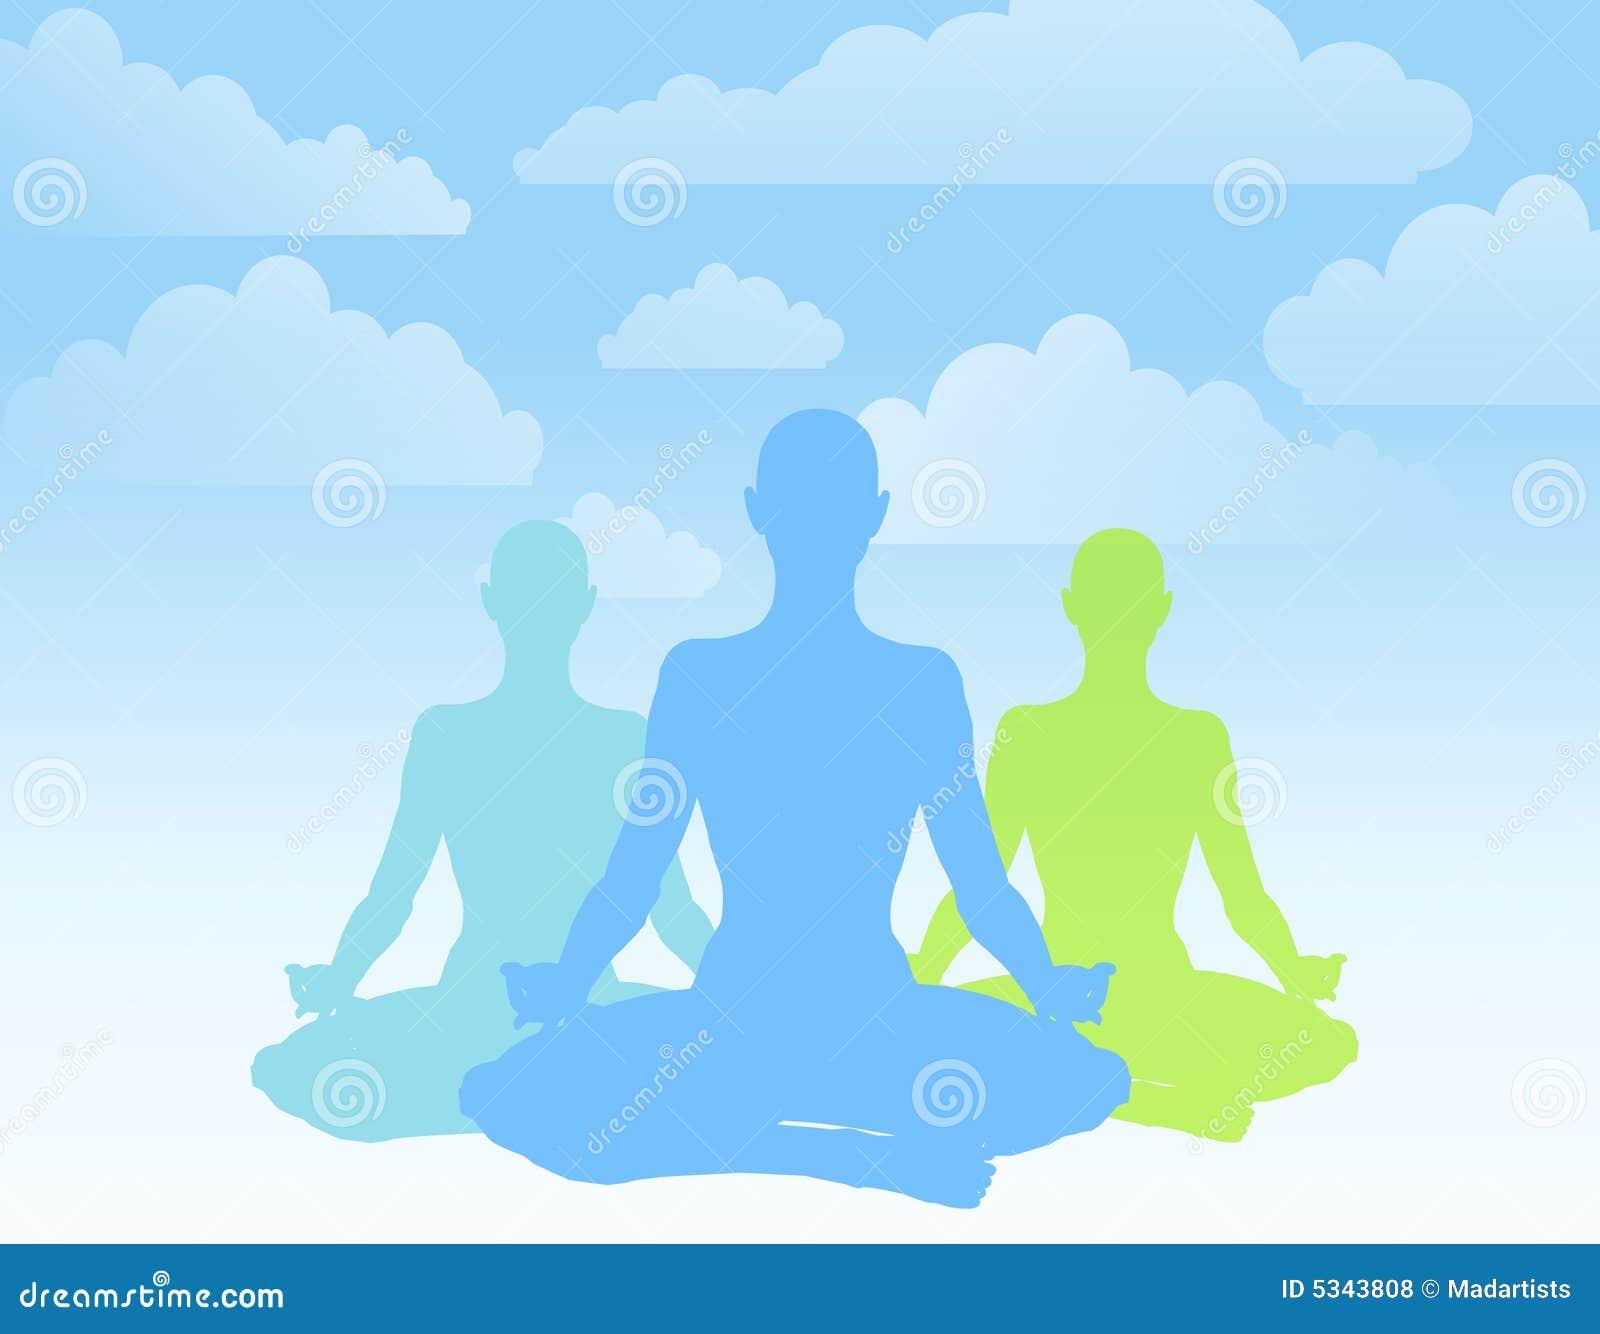 Sitting Position Yoga Silhouettes